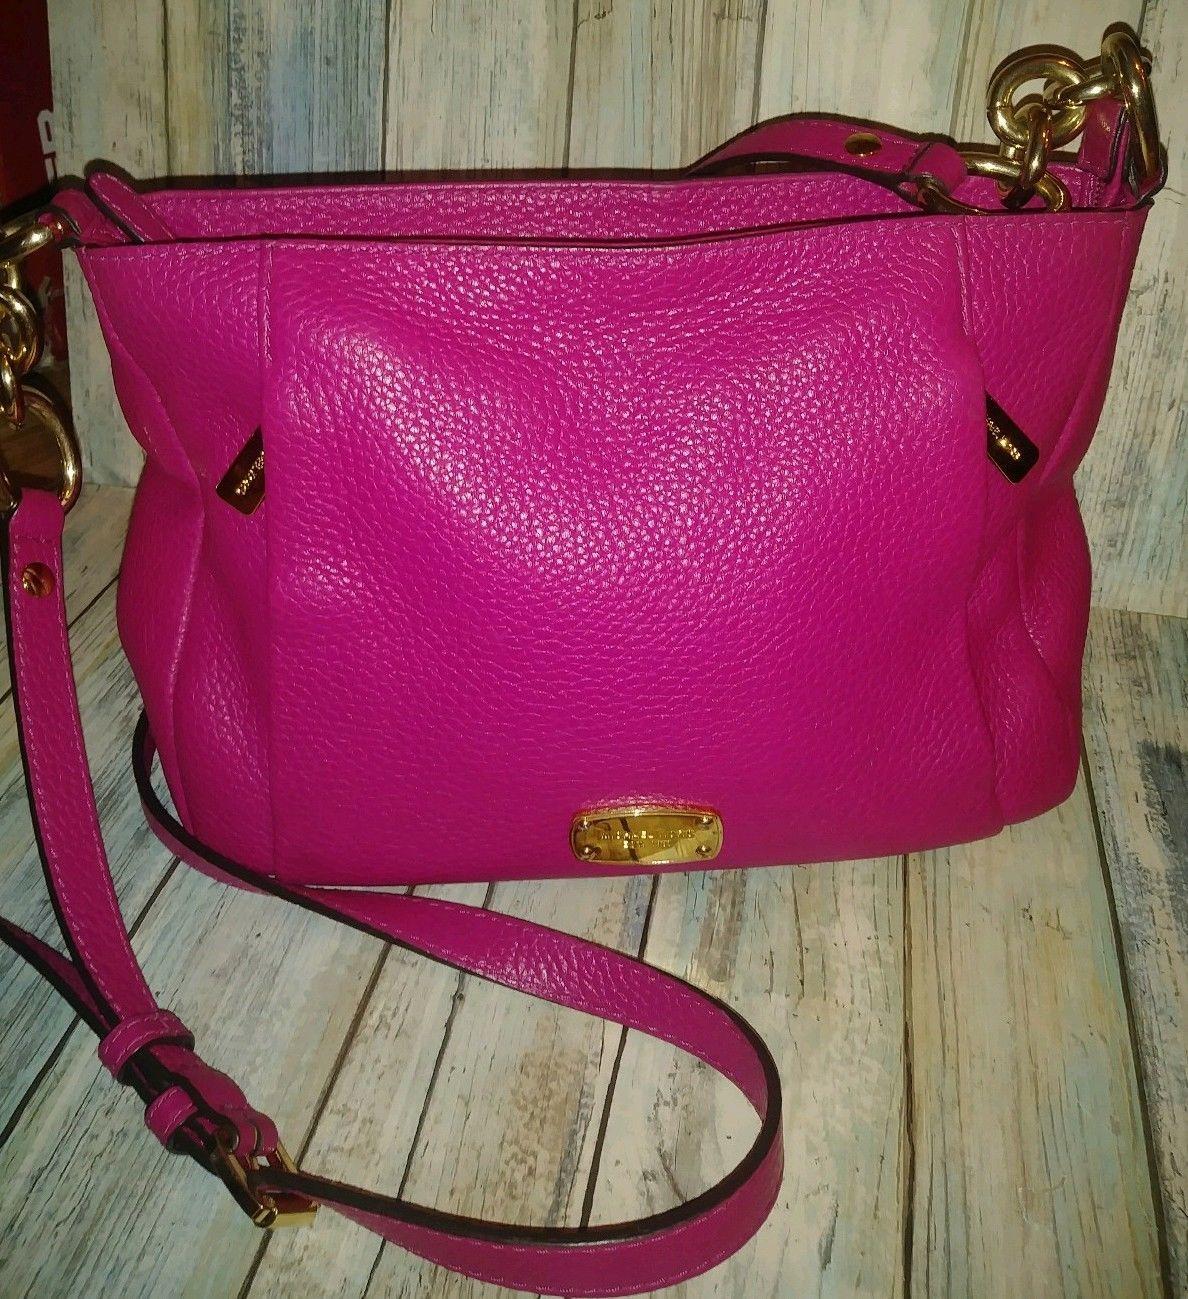 9abed5410e52 ... store michael kors hallie md messenger leather crossbody purse pink  lipstick bag 248 f1700 cb0a0 ...